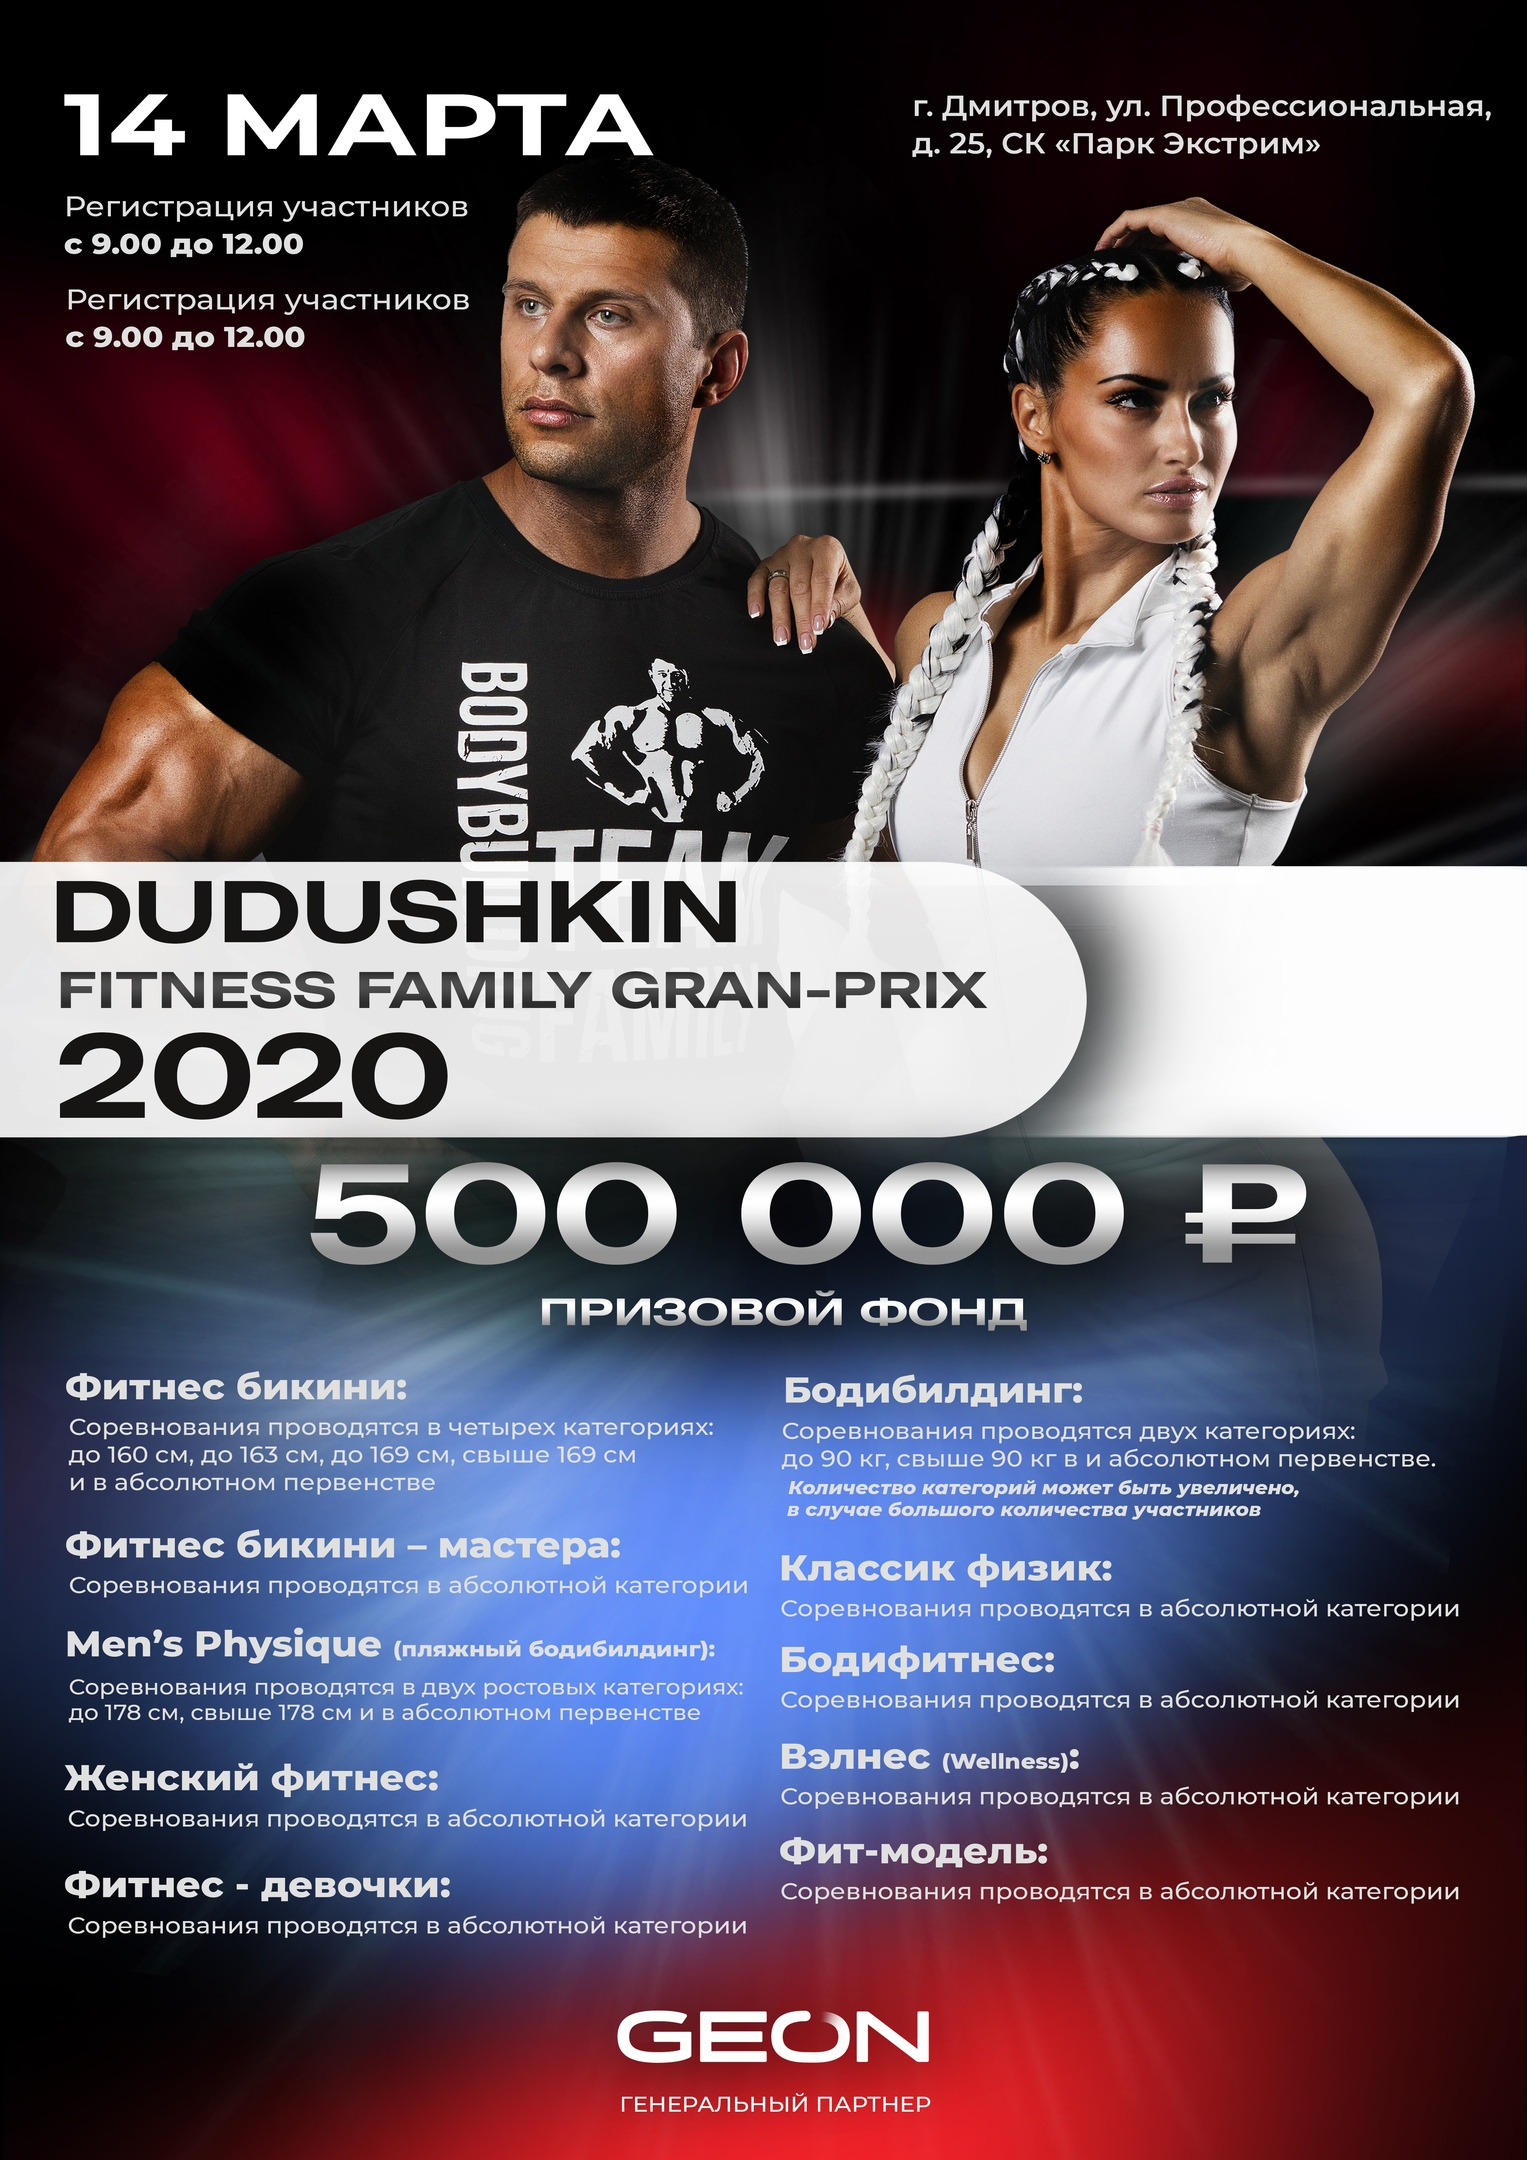 Положение: Grand-Prix Dudushkin Fitness Family - 2020